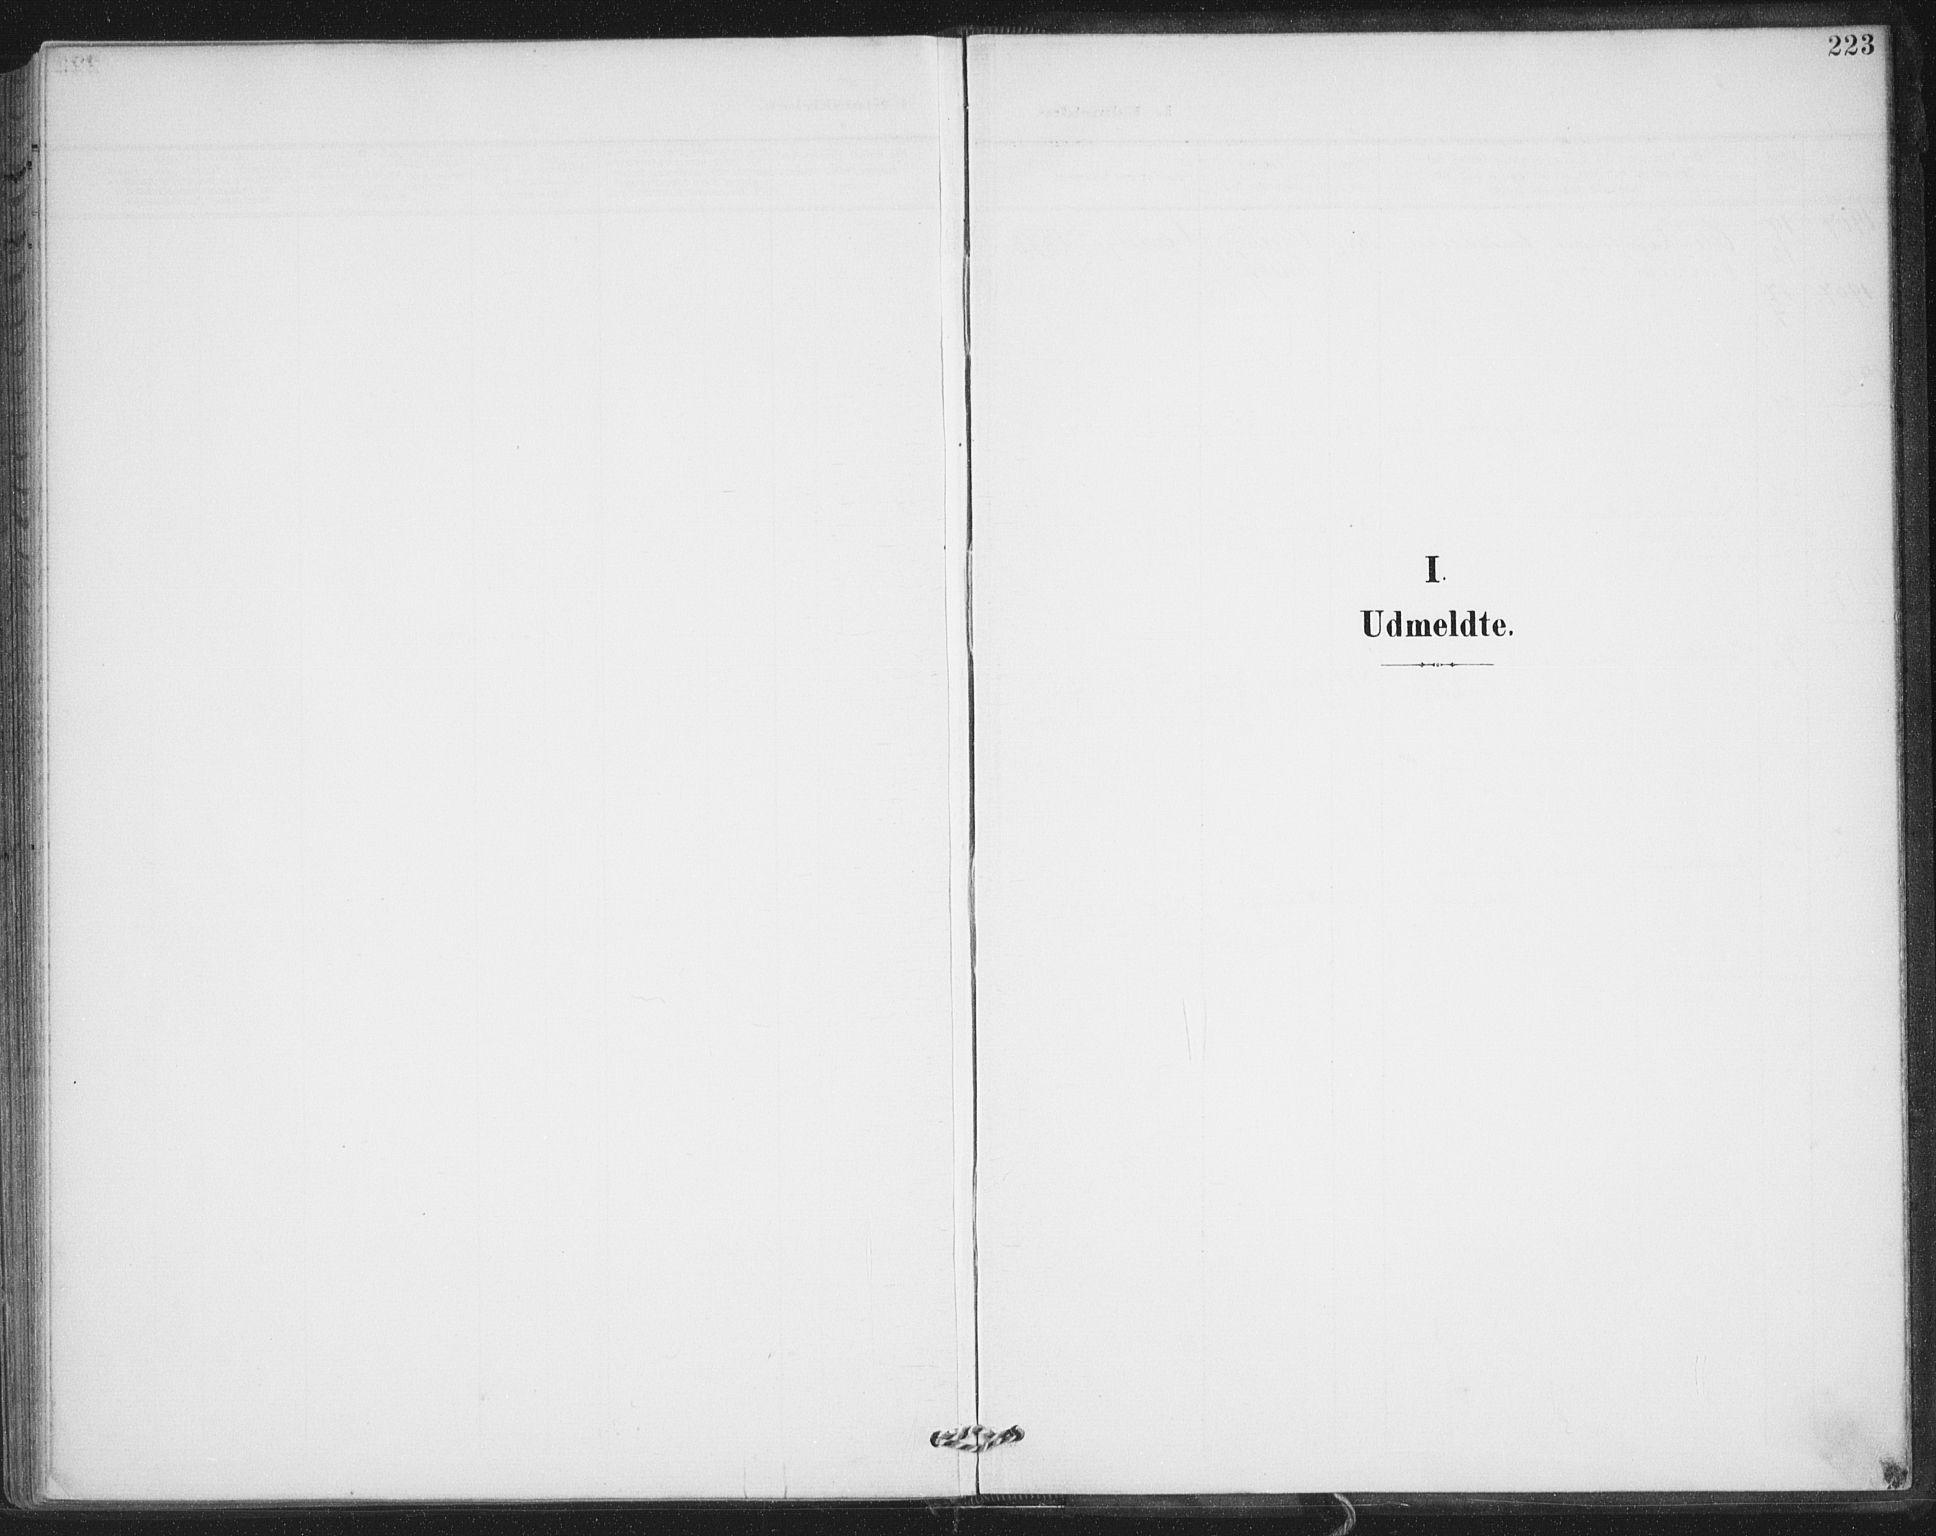 SAO, Varteig prestekontor Kirkebøker, F/Fa/L0003: Ministerialbok nr. 3, 1899-1919, s. 223